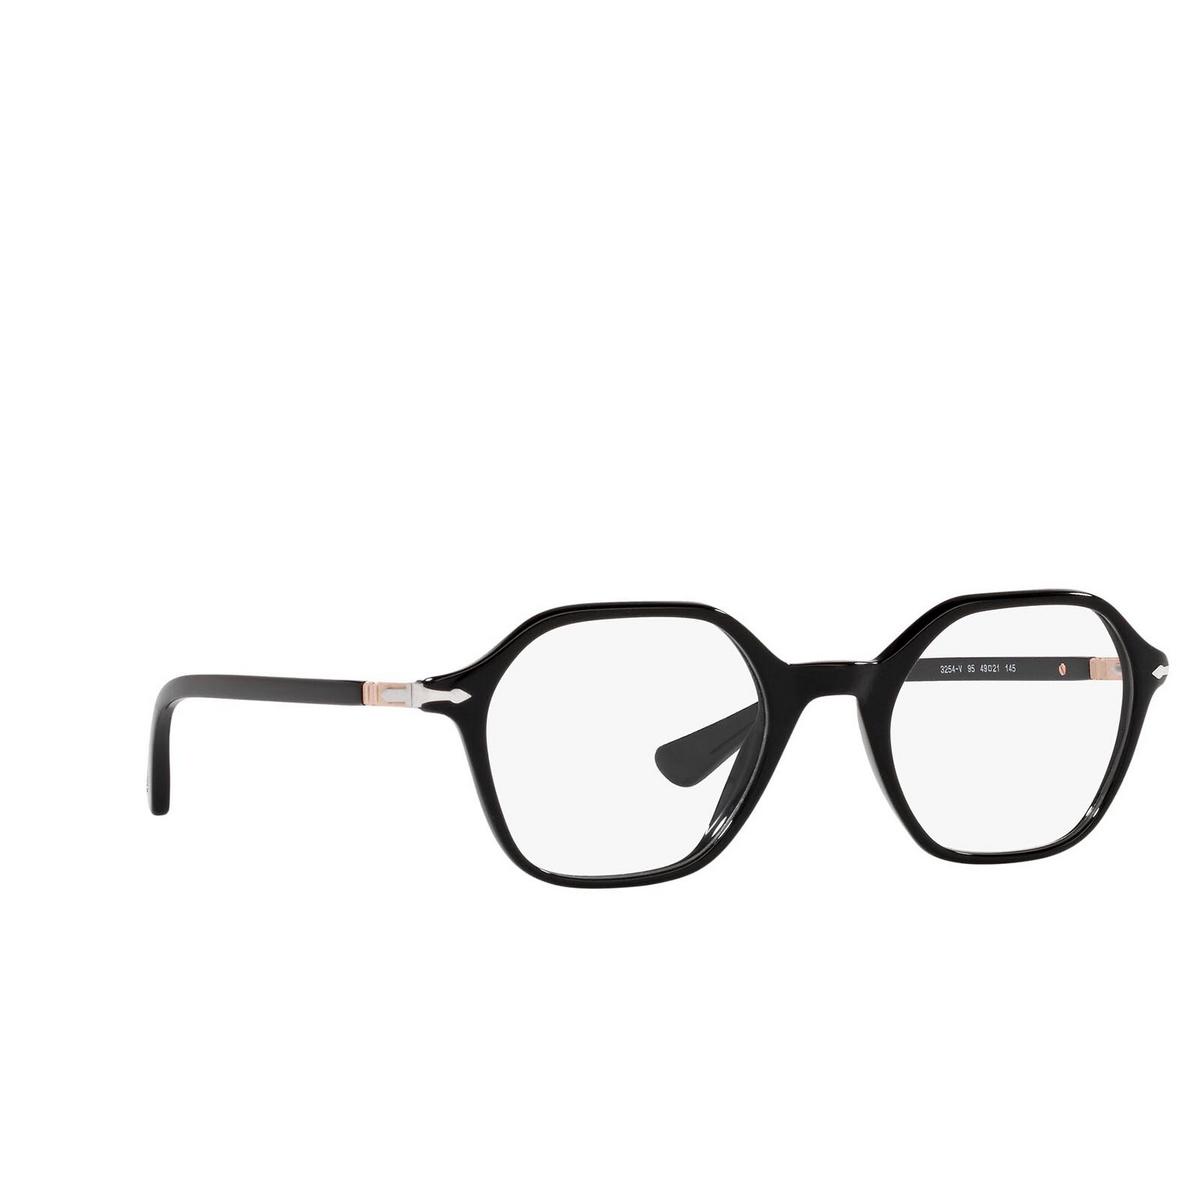 Persol® Irregular Eyeglasses: PO3254V color Black 95 - three-quarters view.